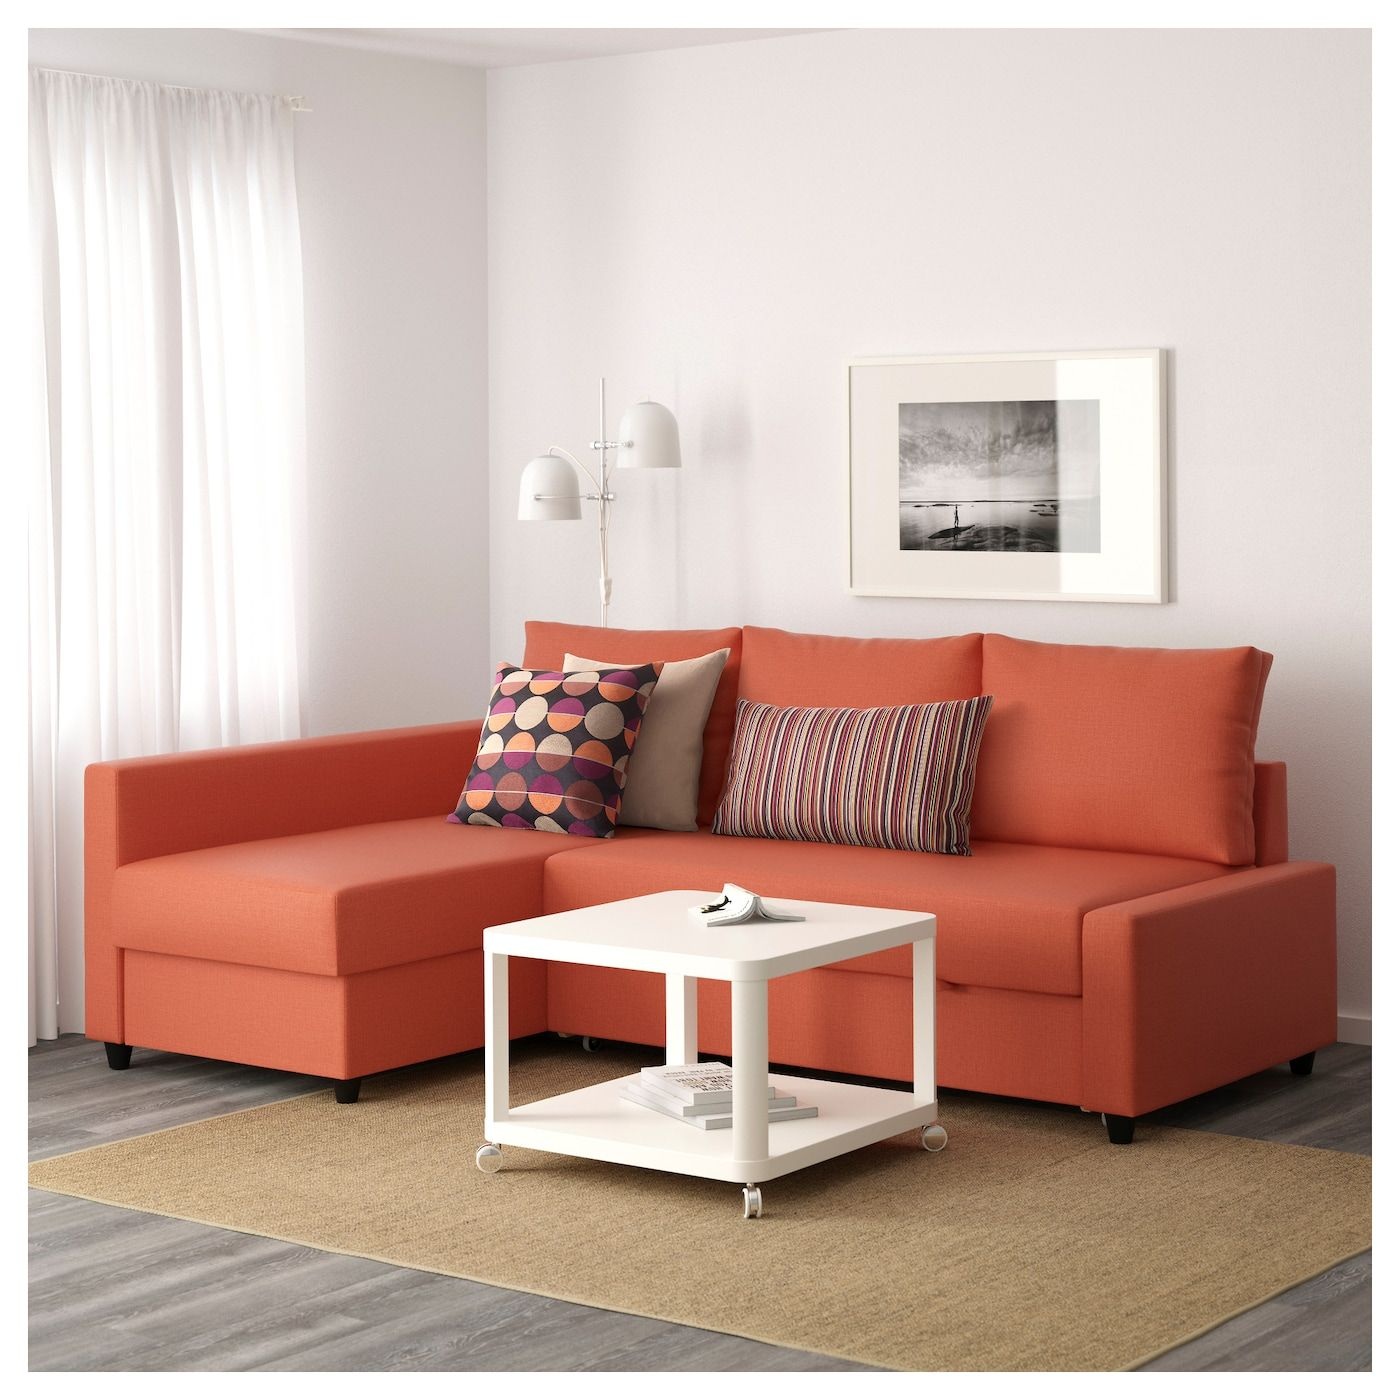 Ikea Us Furniture And Home Furnishings Corner Sofa Bed With Storage Sofa Bed With Storage Ikea Corner Sofa